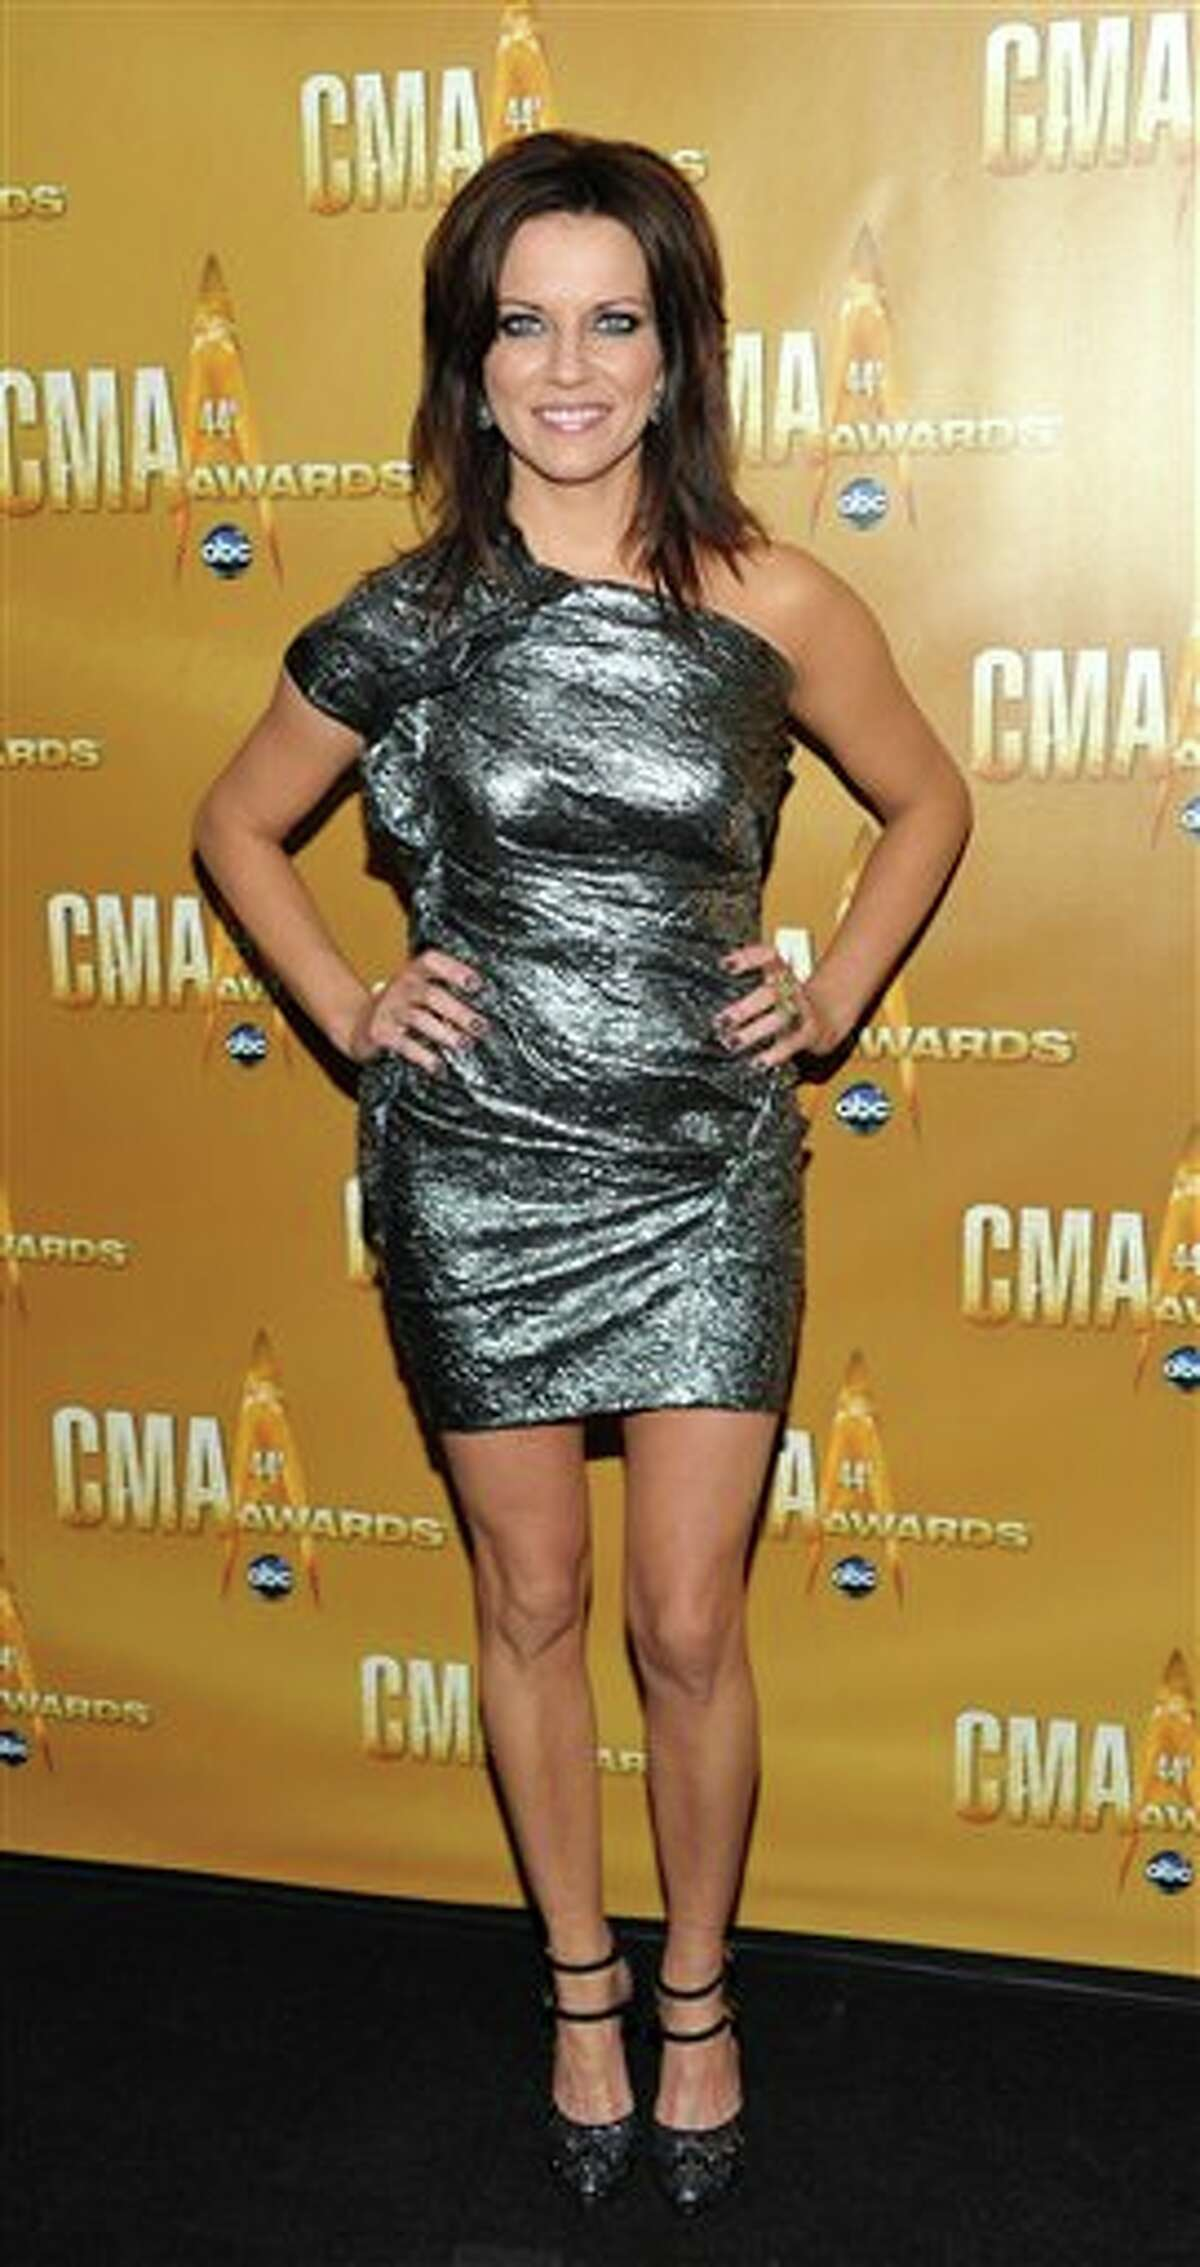 Singer Martina McBride attends the 44th Annual Country Music Awards in Nashville, Tenn. on Wednesday, Nov. 10, 2010. (AP Photo/Evan Agostini)